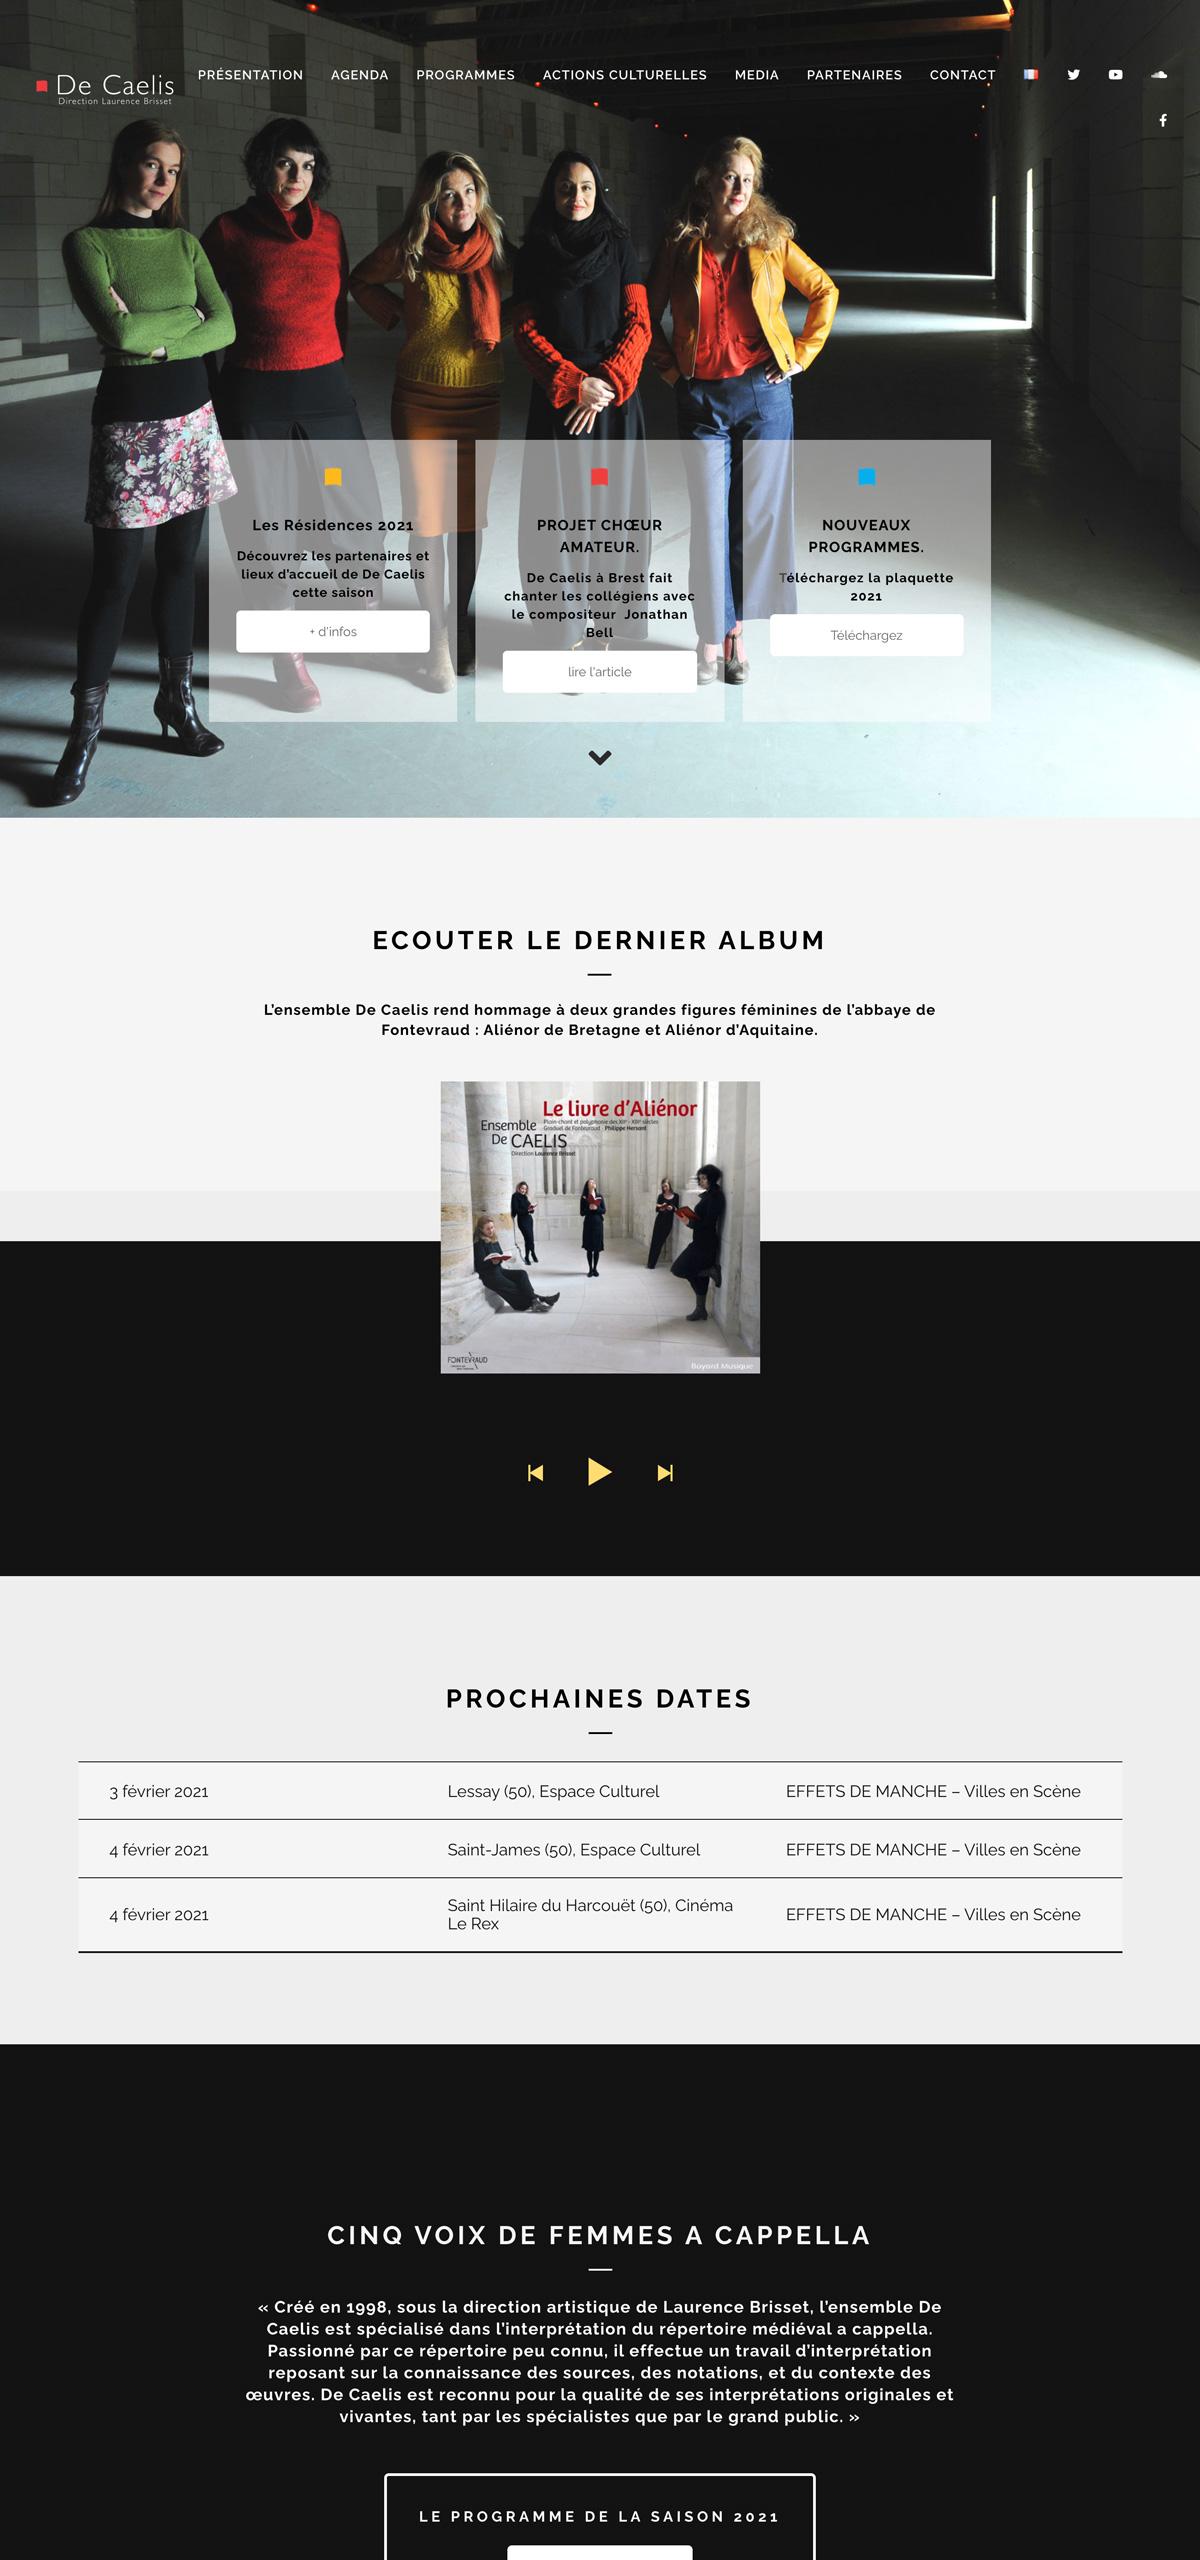 rdsc ensemble de caelis website screenshot